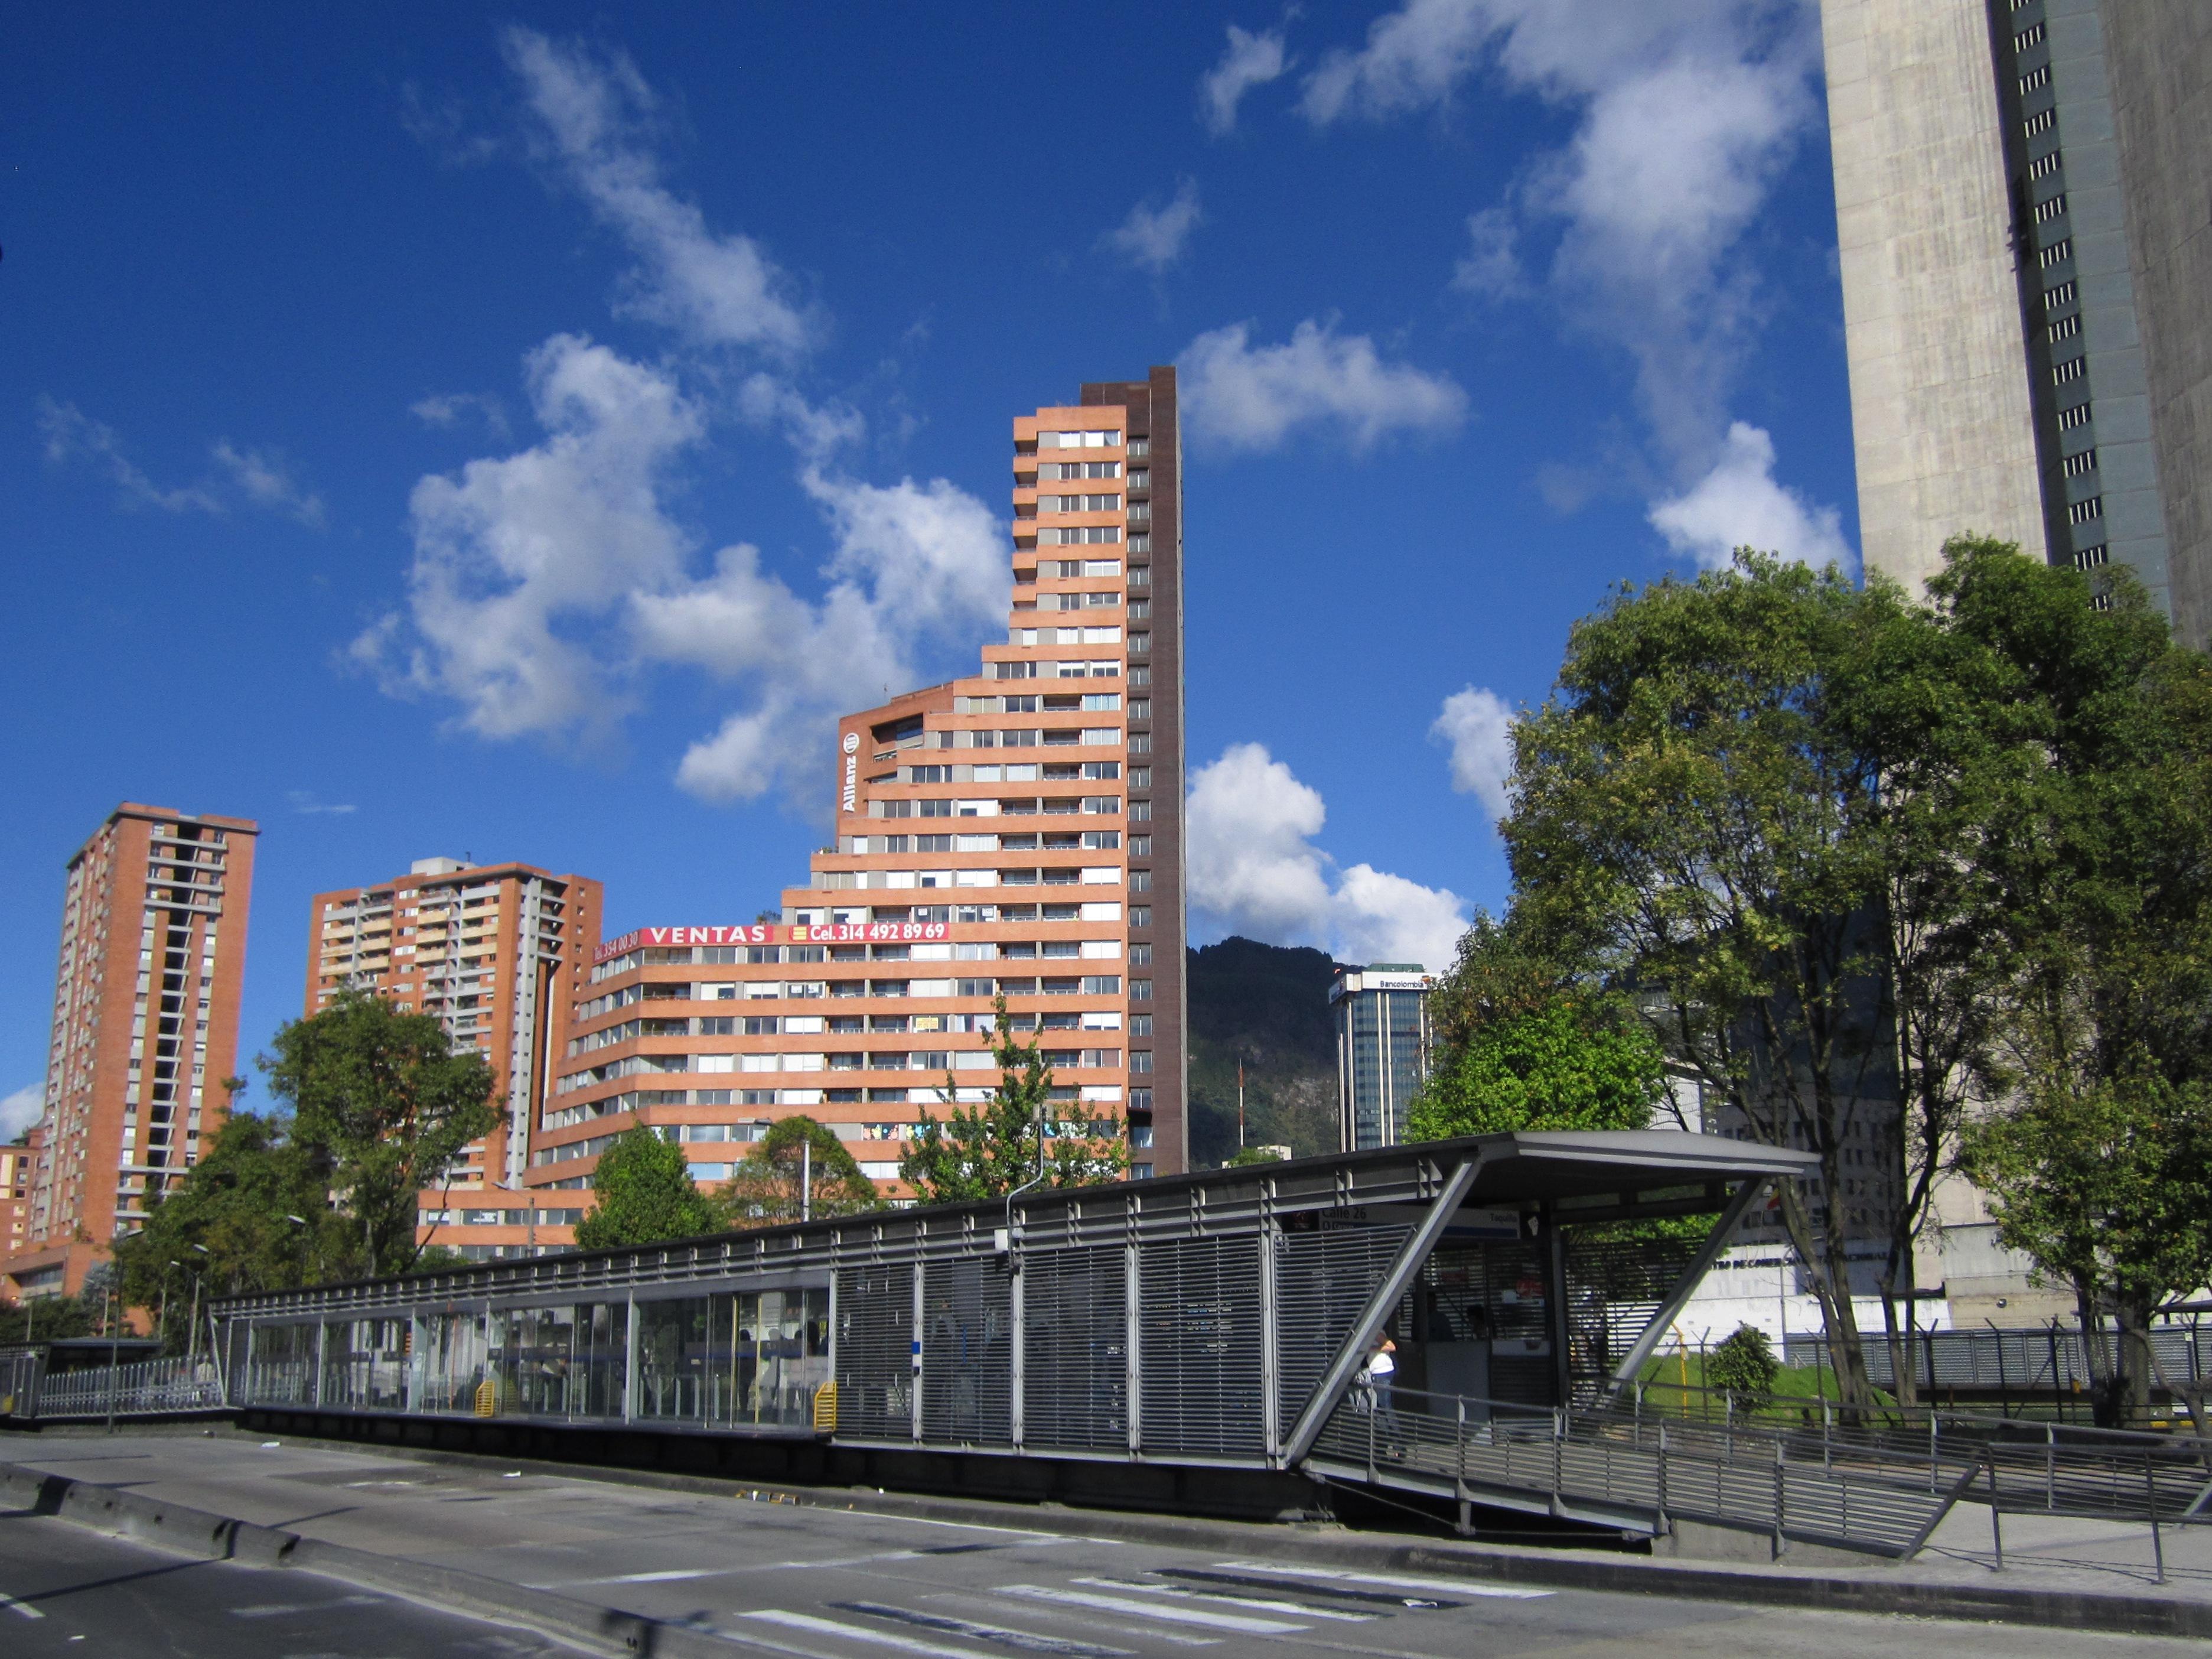 Archivo Avenida Caracas Estacion Transmilenio Calle 26 Jpg Wikipedia La Enciclopedia Libre